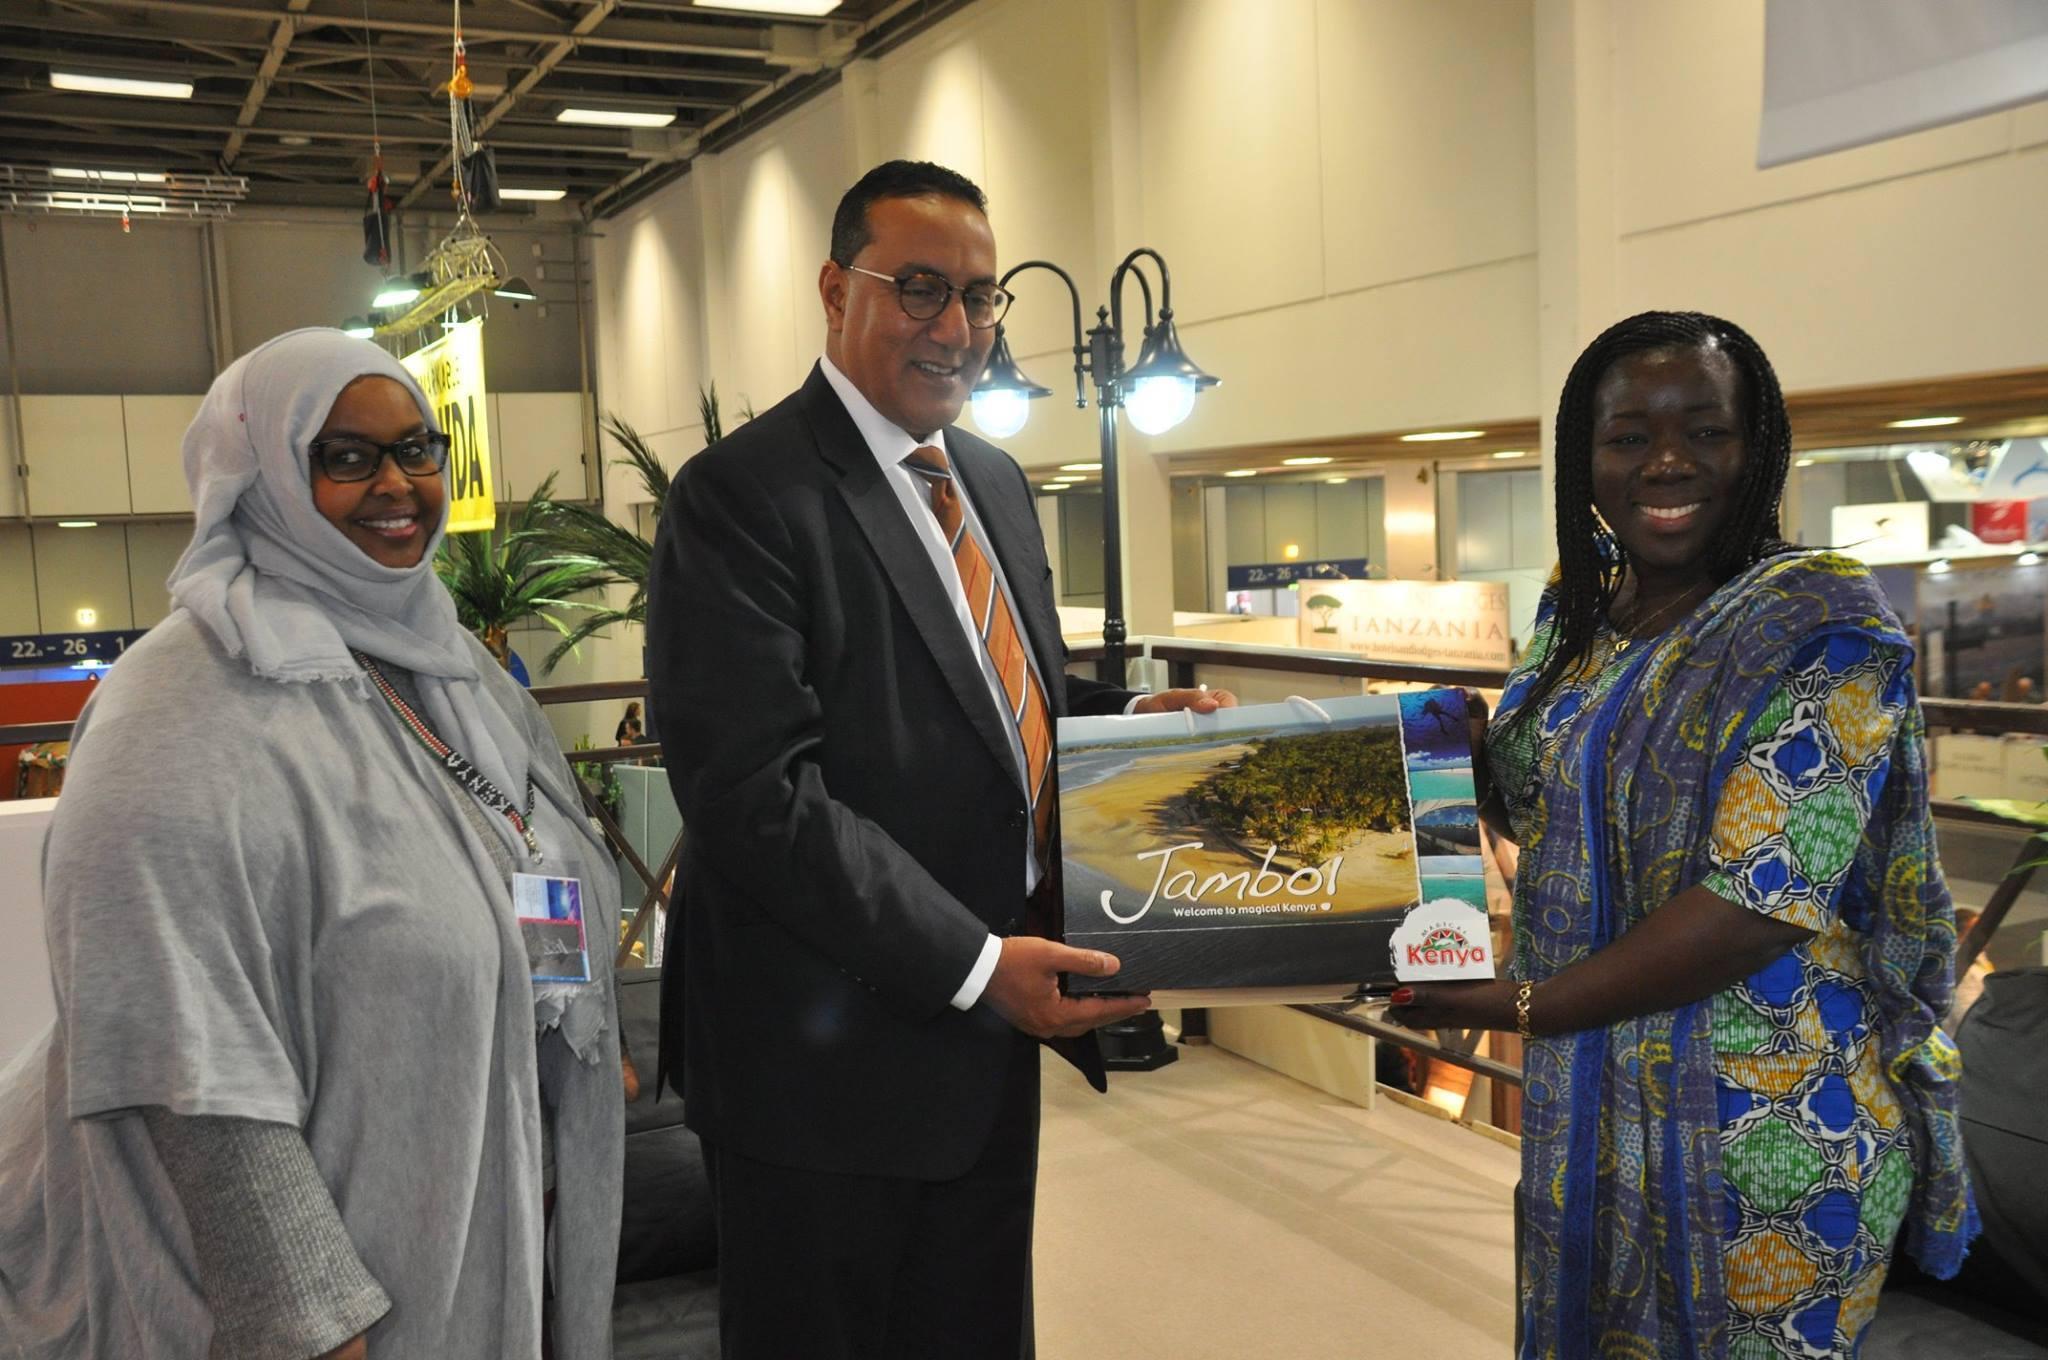 Fatuma Hirsi Mohamed, Najib Balala and Elizabeth Ofosu-Agyare